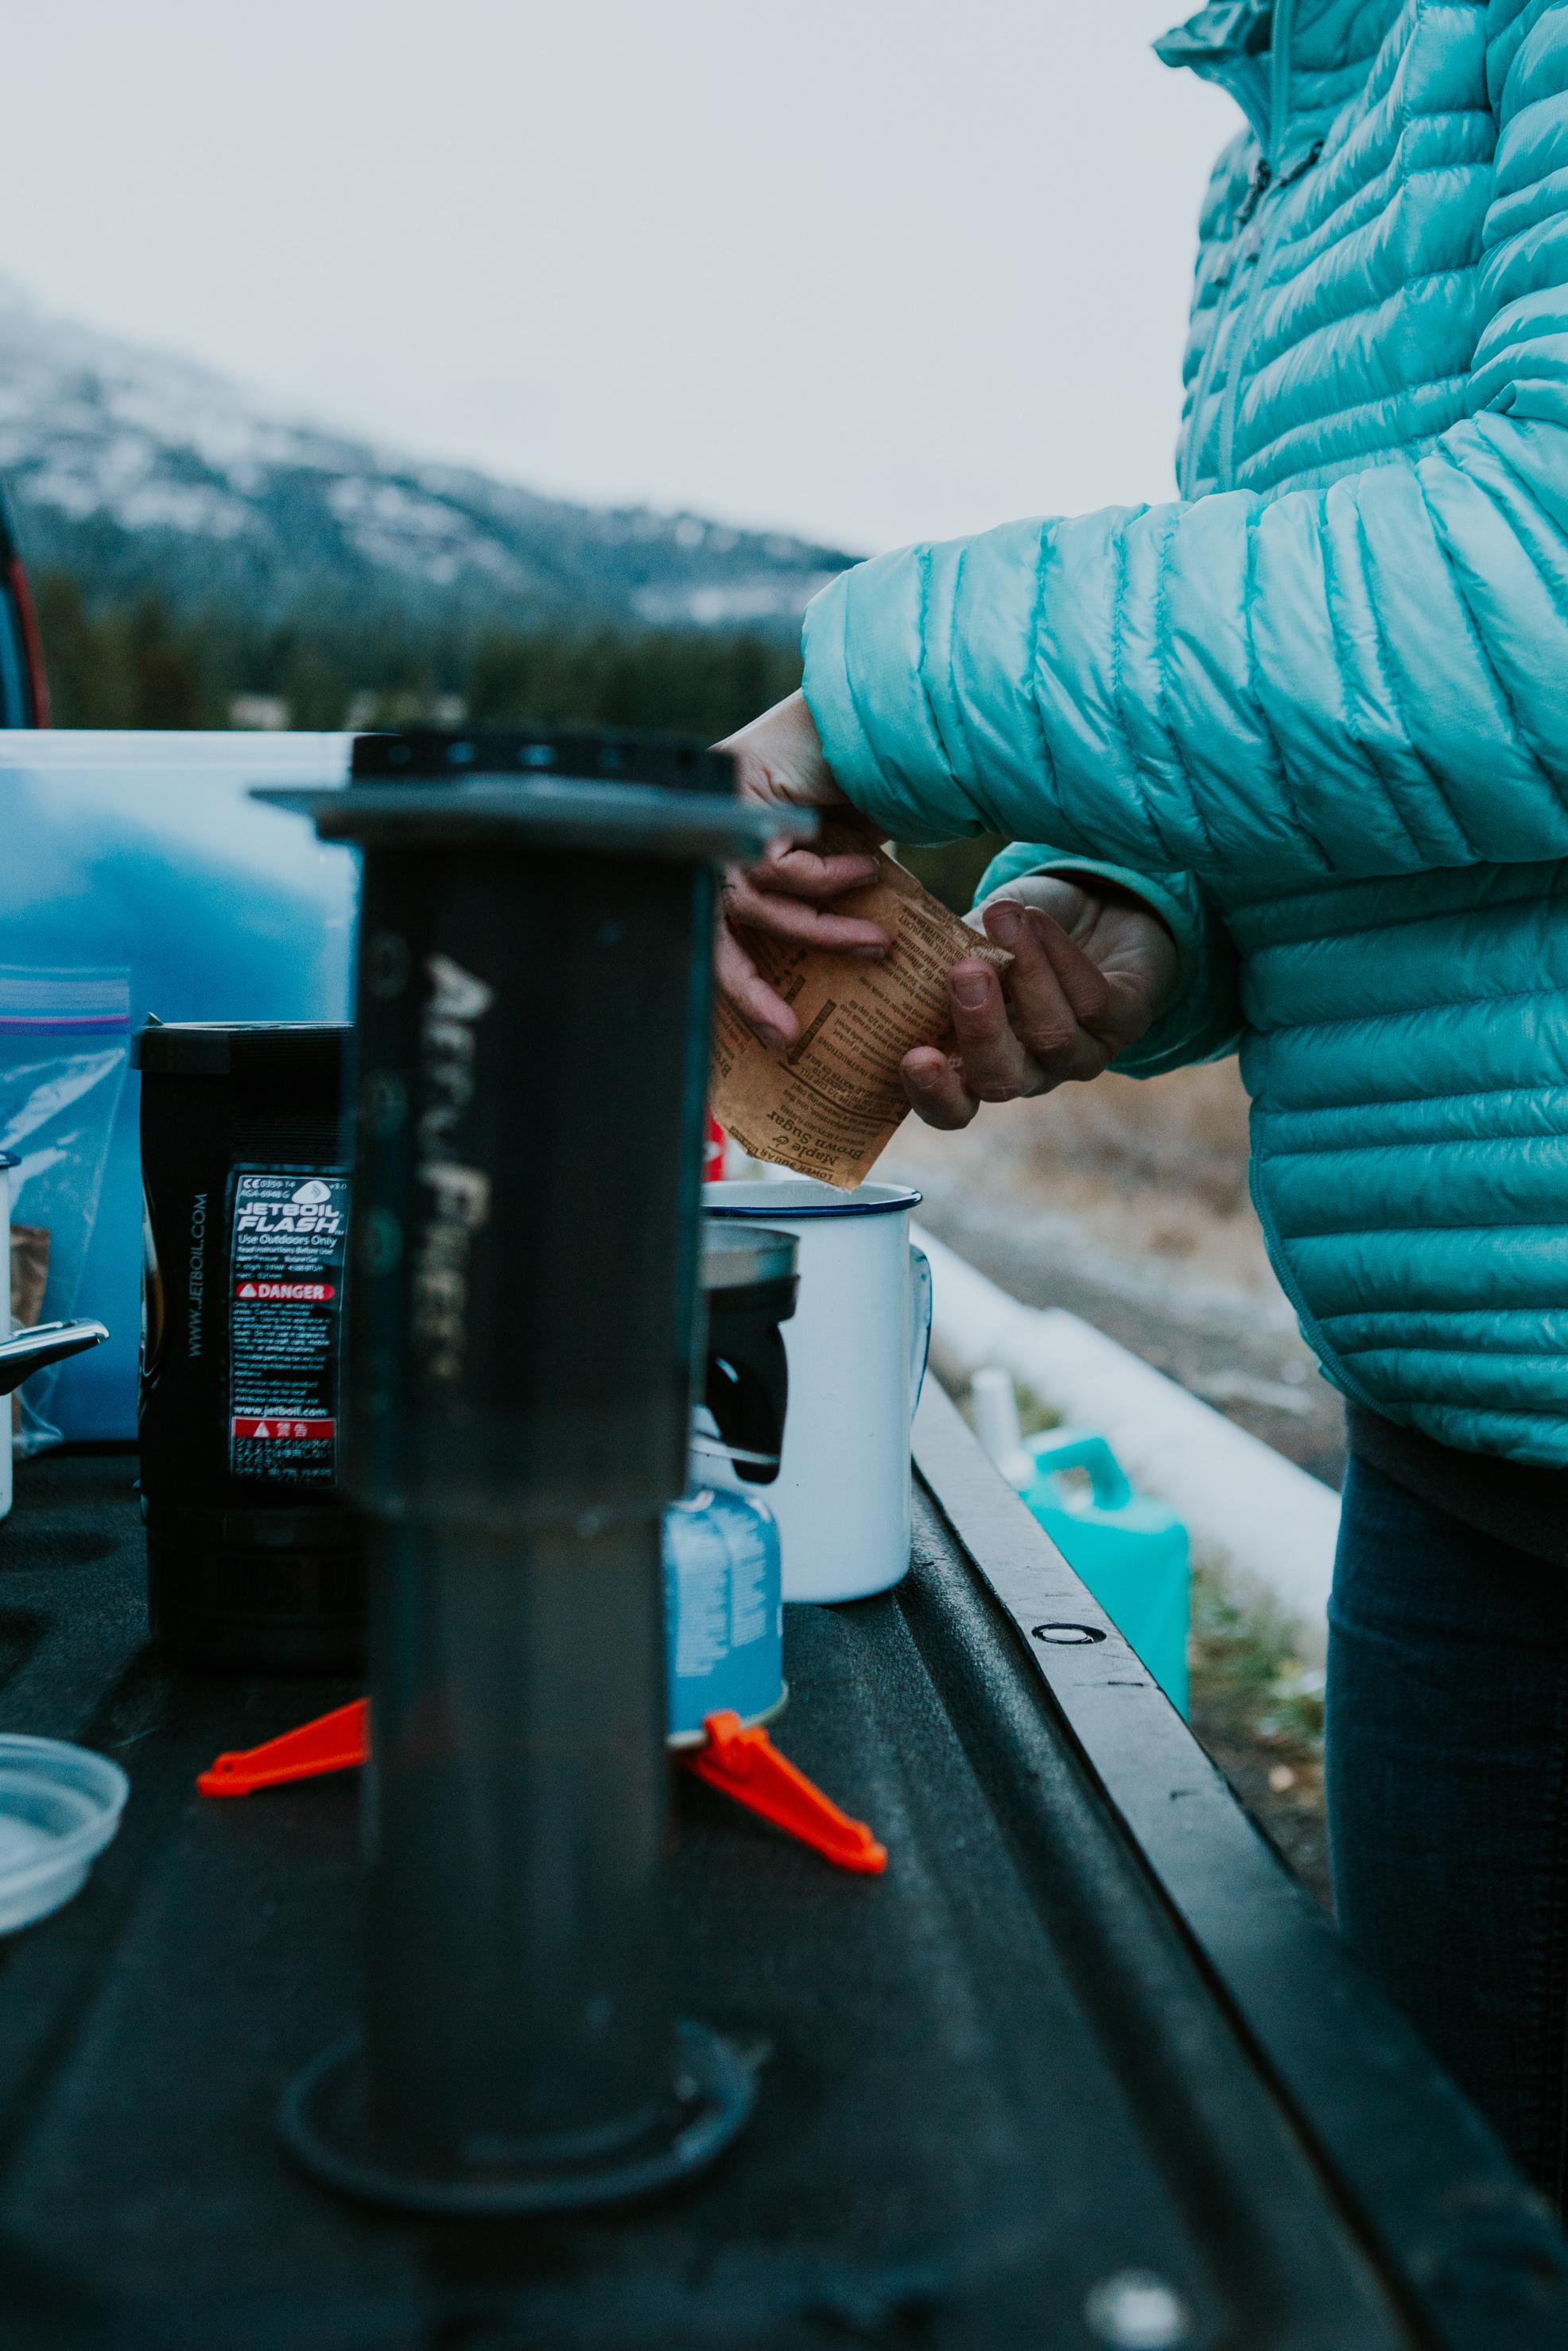 CindyGiovagnoli_outdoor_adventure_photography_Grand_Teton_Yellowstone_Glacier_National_Park_Montana_Wyoming_South_Dakota_Mount_Rushmore_Badlands-020.jpg